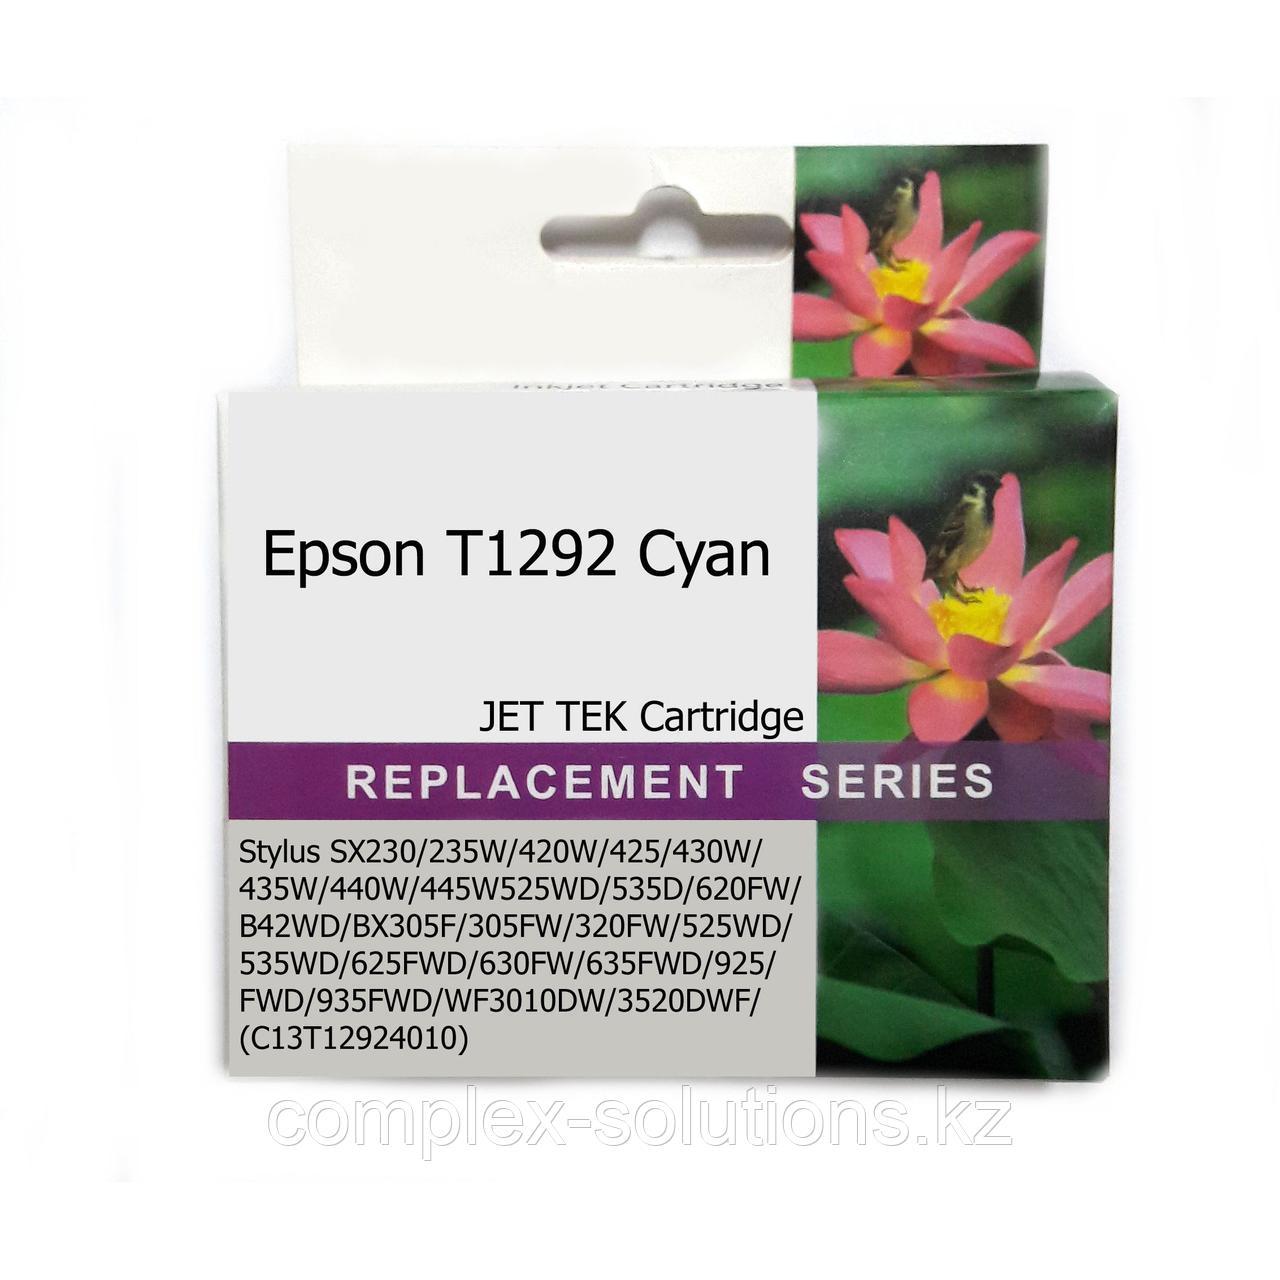 Картридж EPSON T1292 Cyan JET TEK | [качественный дубликат]